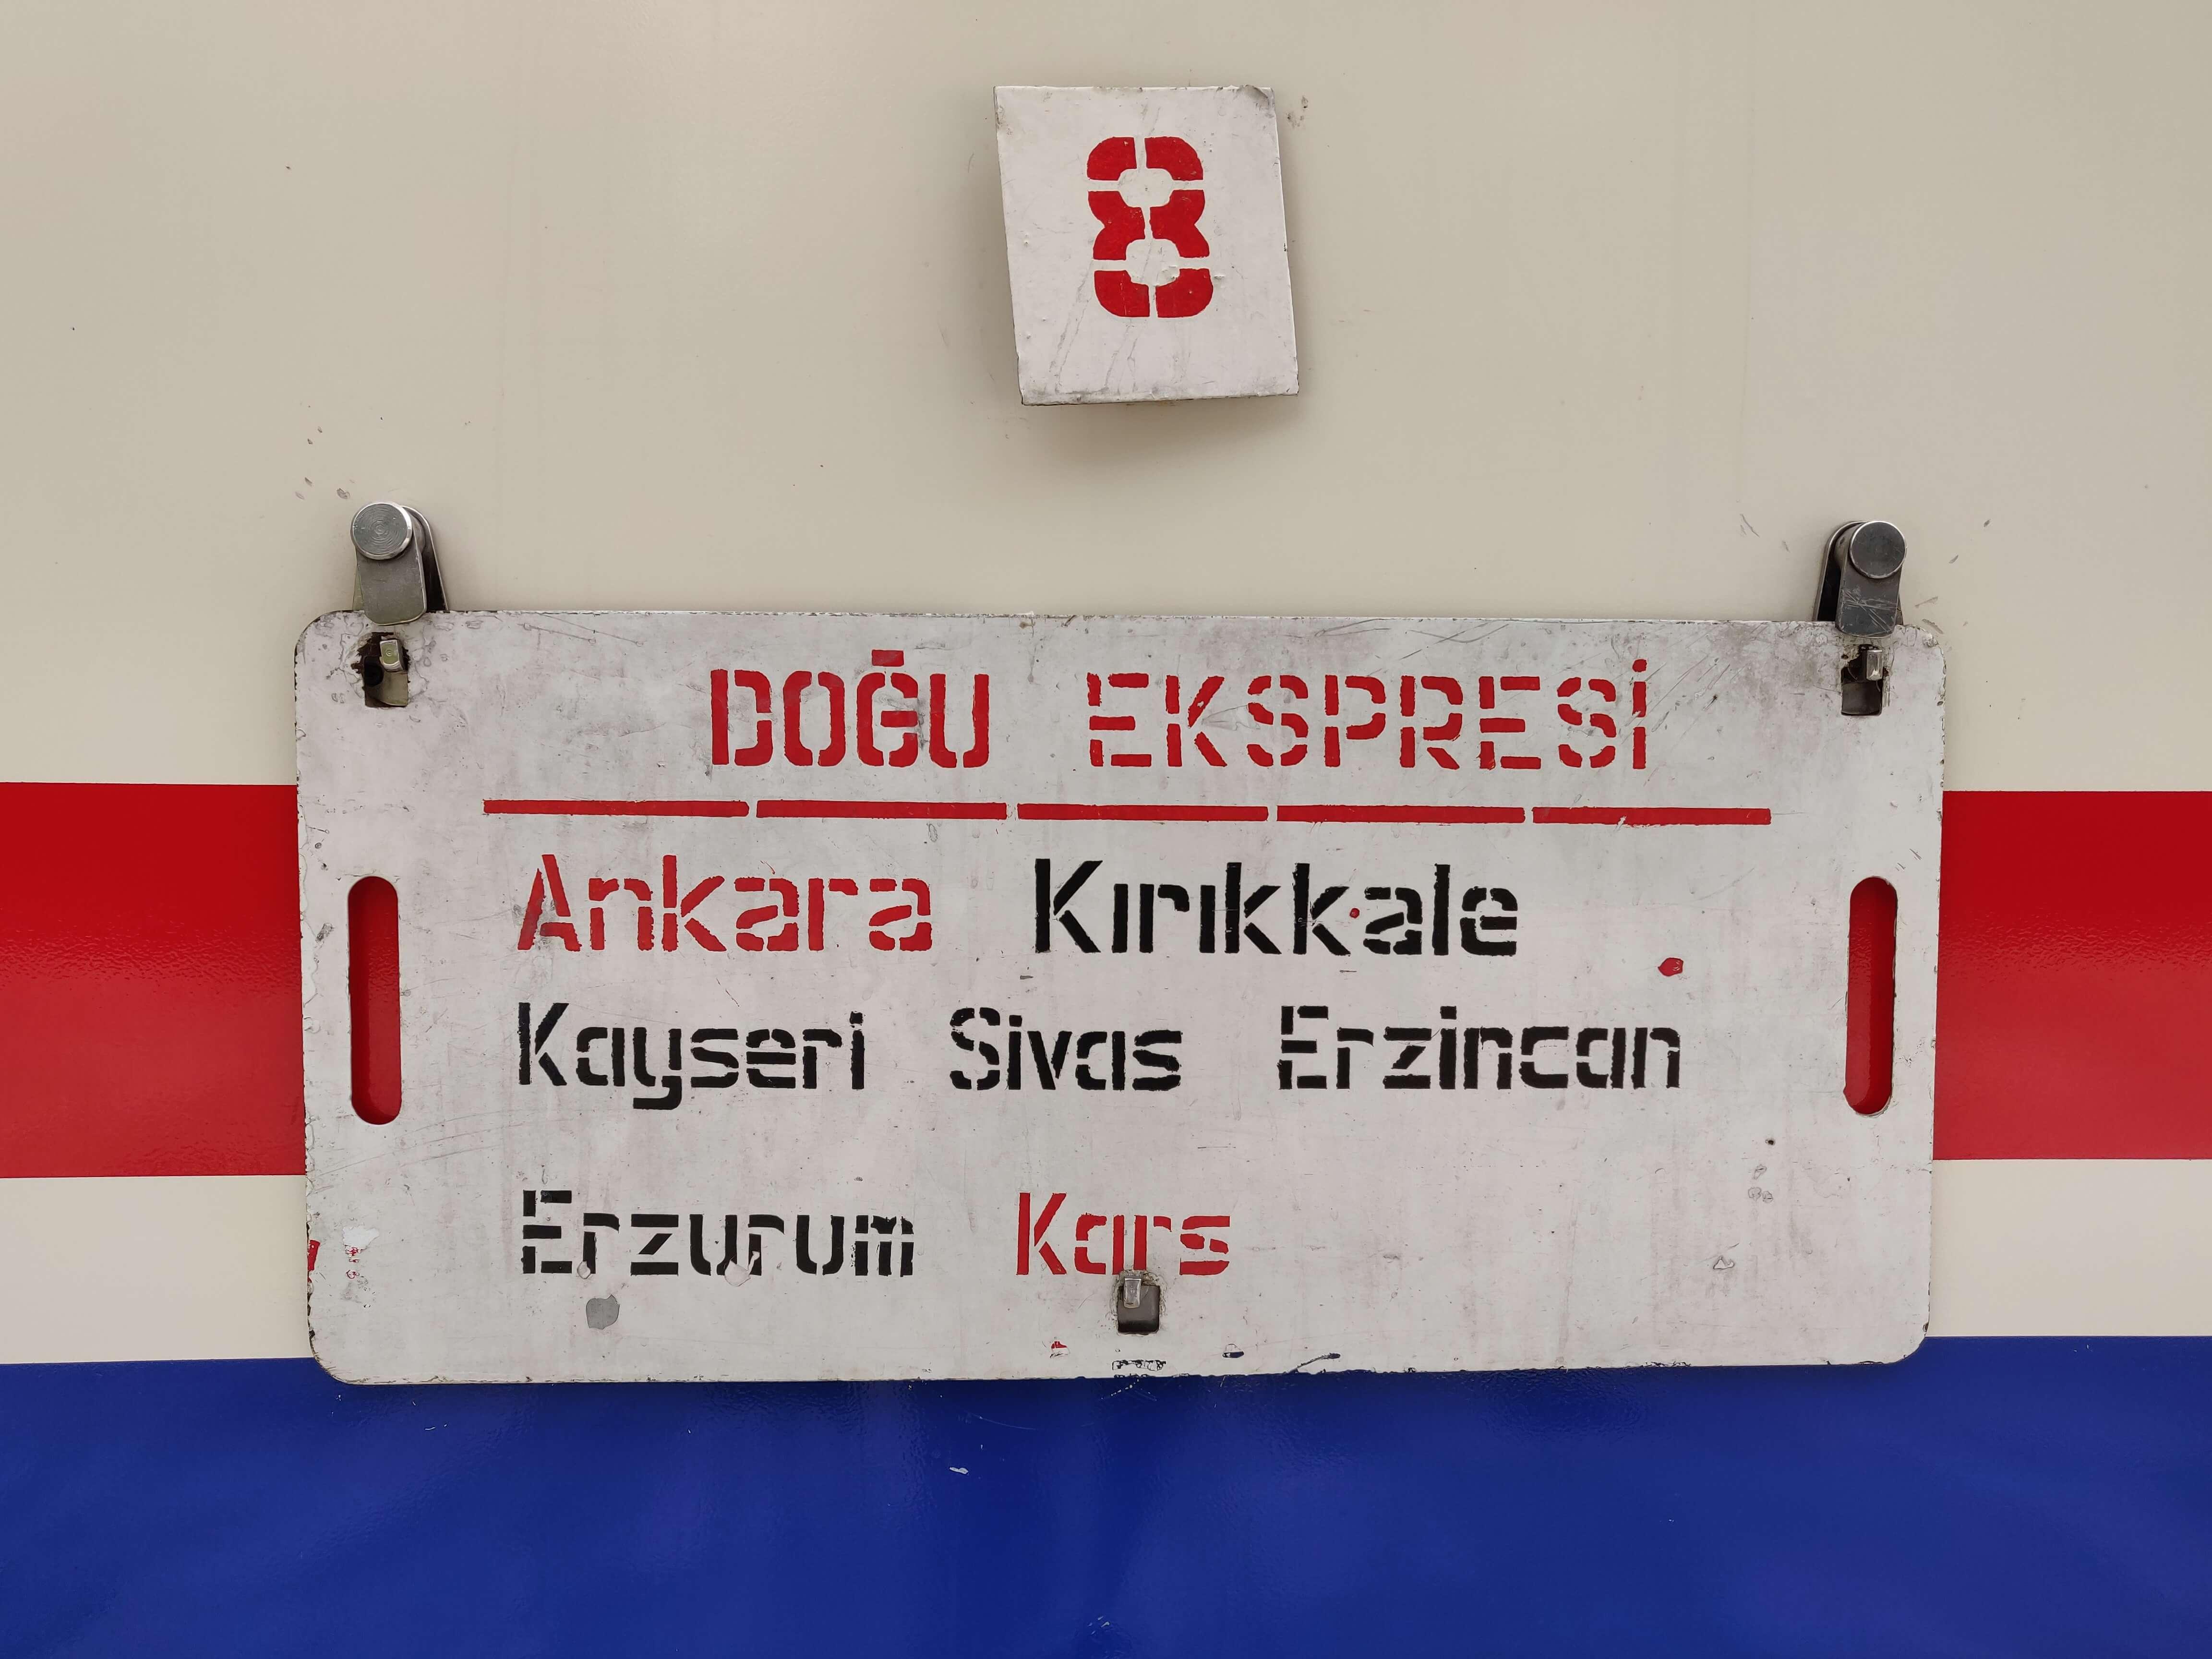 Interrailing - Adventure in east Turkey